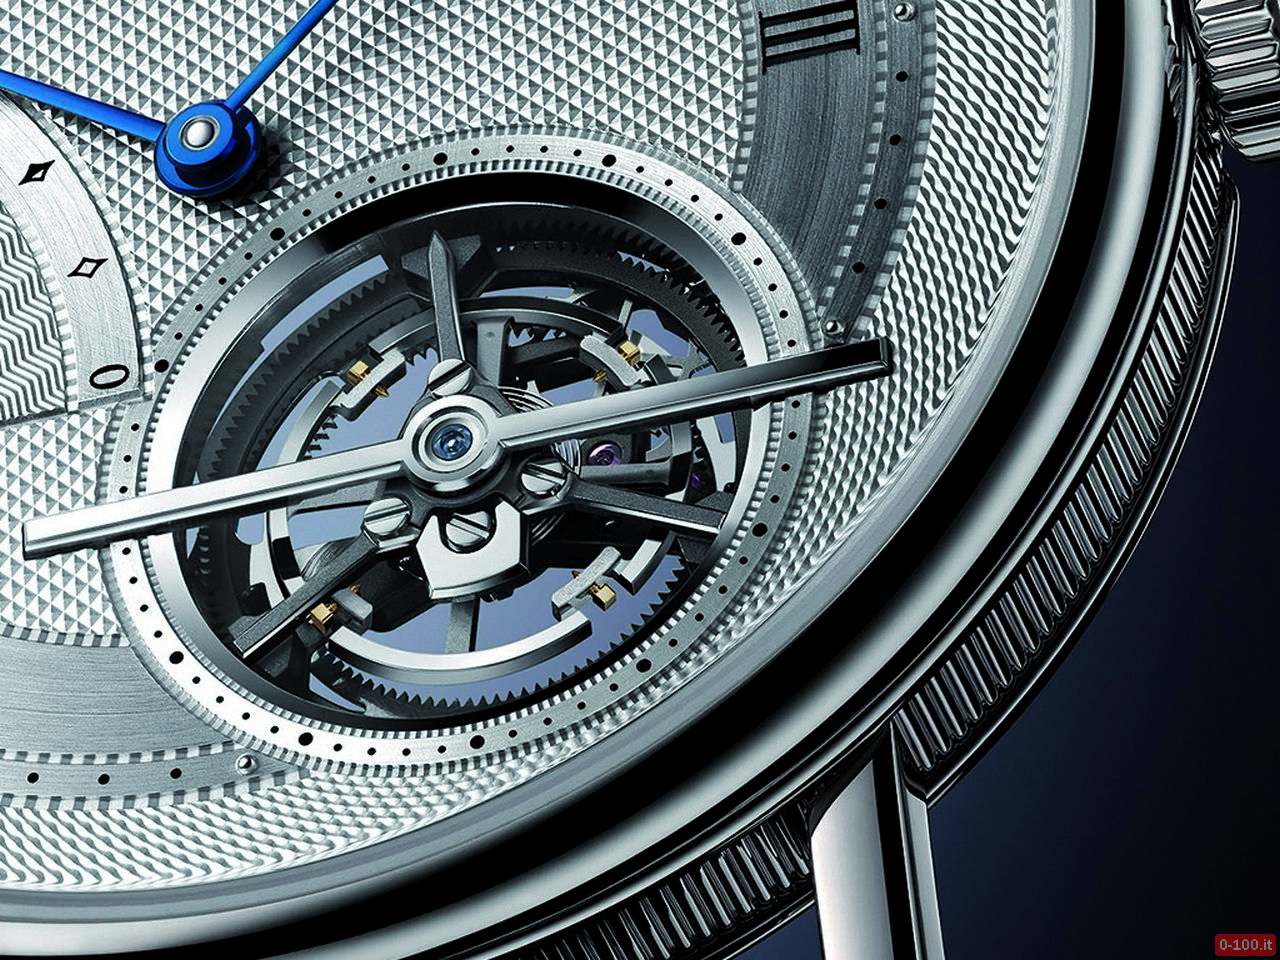 anteprima-baselworld-2014-breguet-classique-grande-complication-tourbillon-extra-plat-automatique-5377-0-100_1